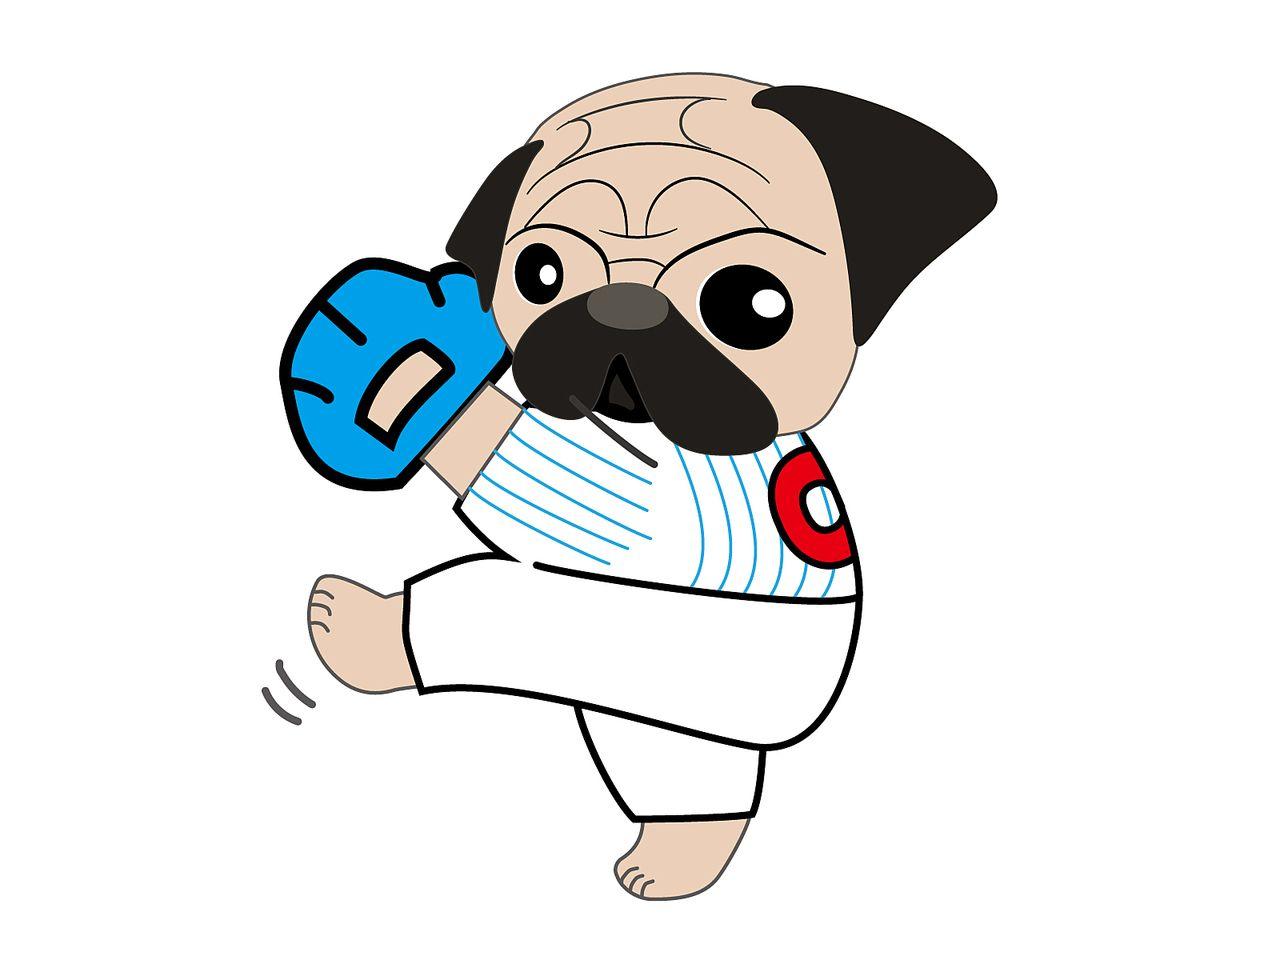 YouTubeの「片岡篤史チャンネル」に侍ジャパンのピッチングコーチ建山義紀さんが早速ゲスト出演をして、東京オリンピック2020の侍ジャパンの裏話をしています。オリンピックが終わってすぐに裏話を聞ける、…